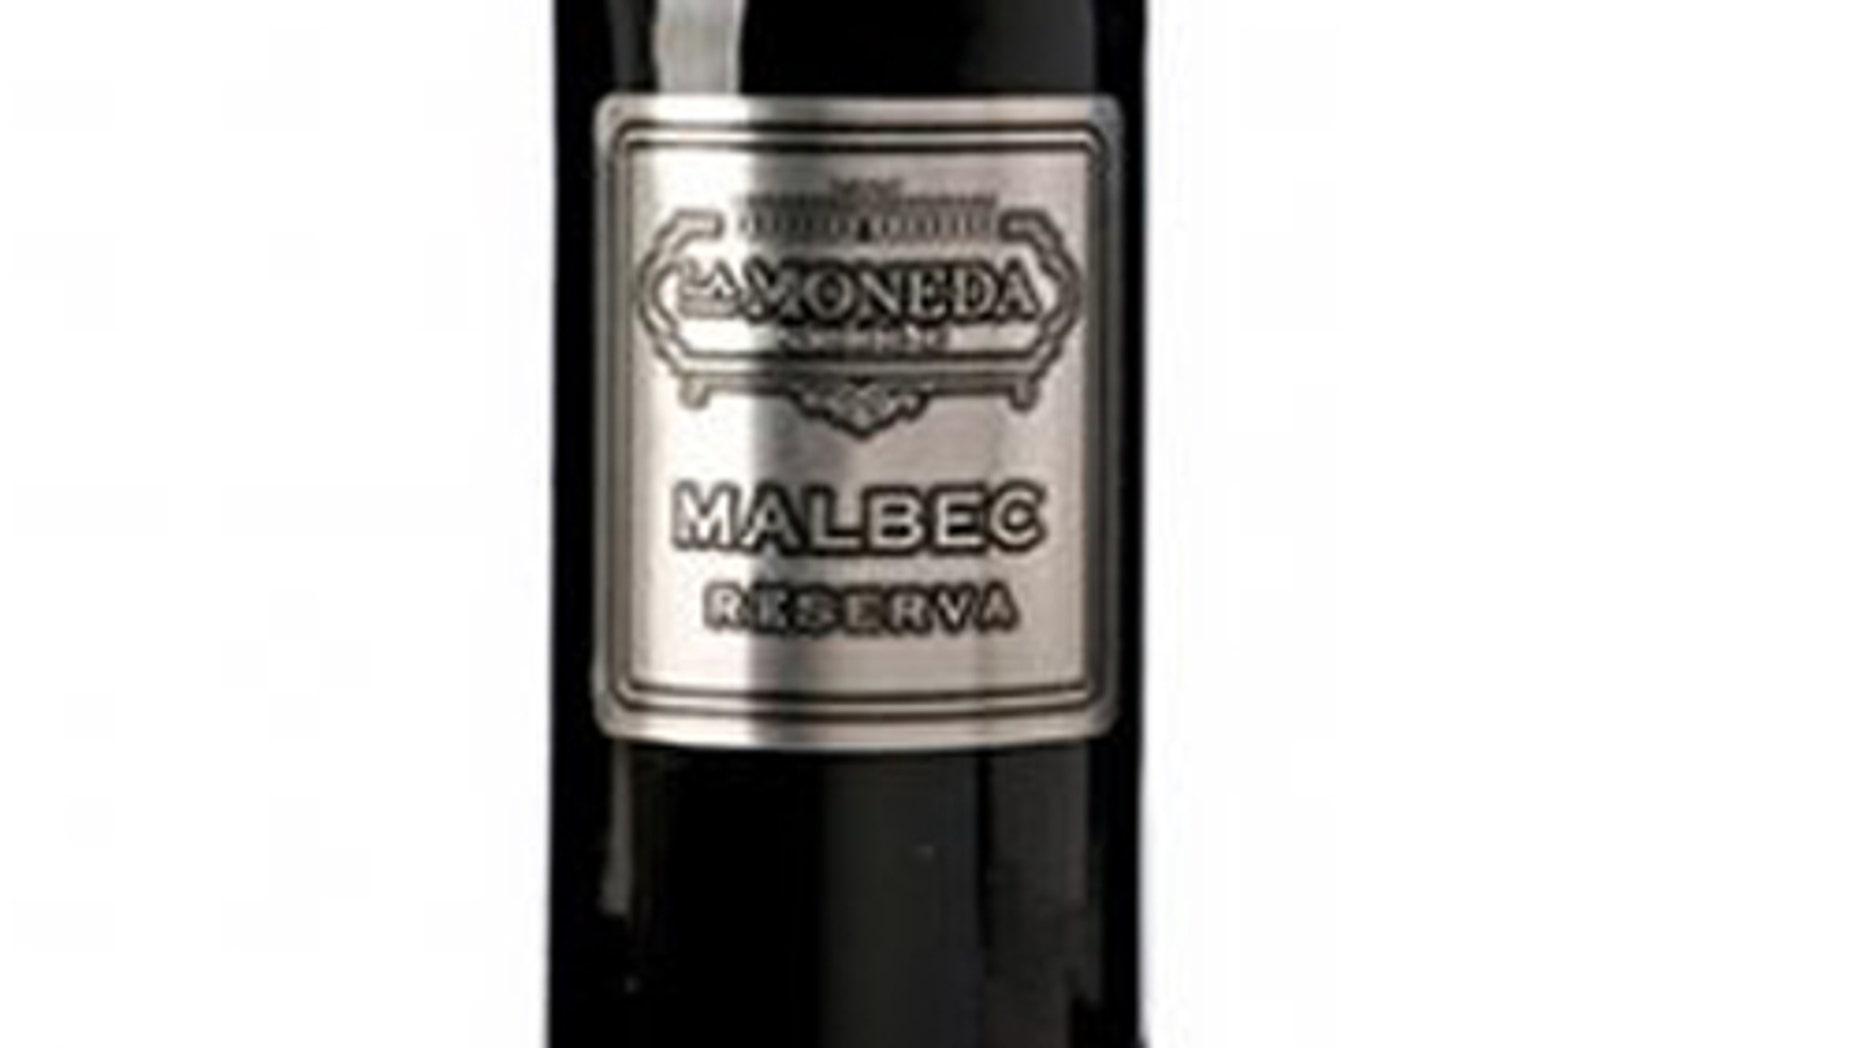 La Moneda Reserva Malbec, a Chilean Malbec available exclusively at Walmart  subsidiary Asda, won